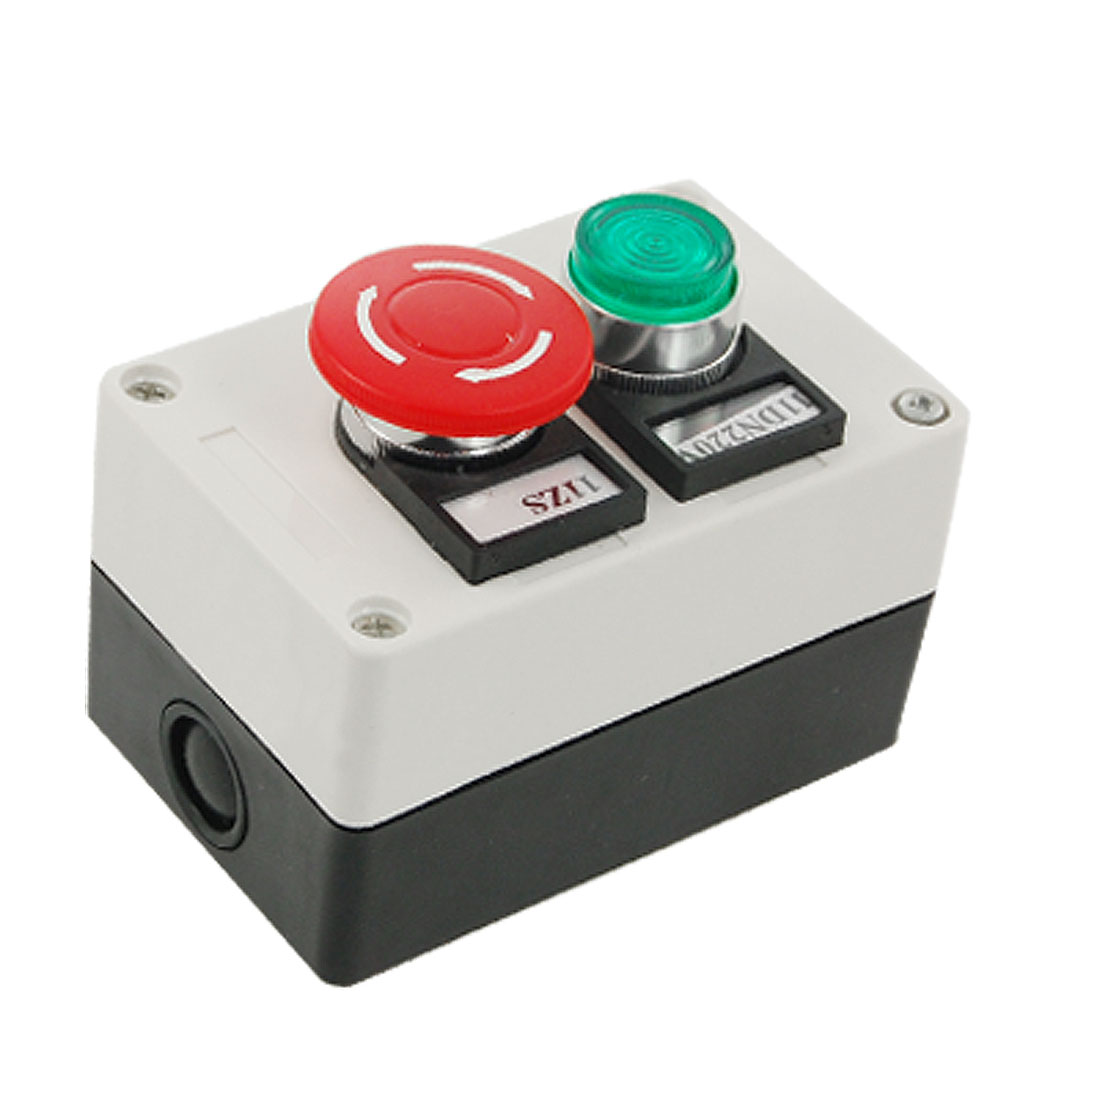 AC 220V Green Indicator Self Locking Switch Rotary Push Button Station